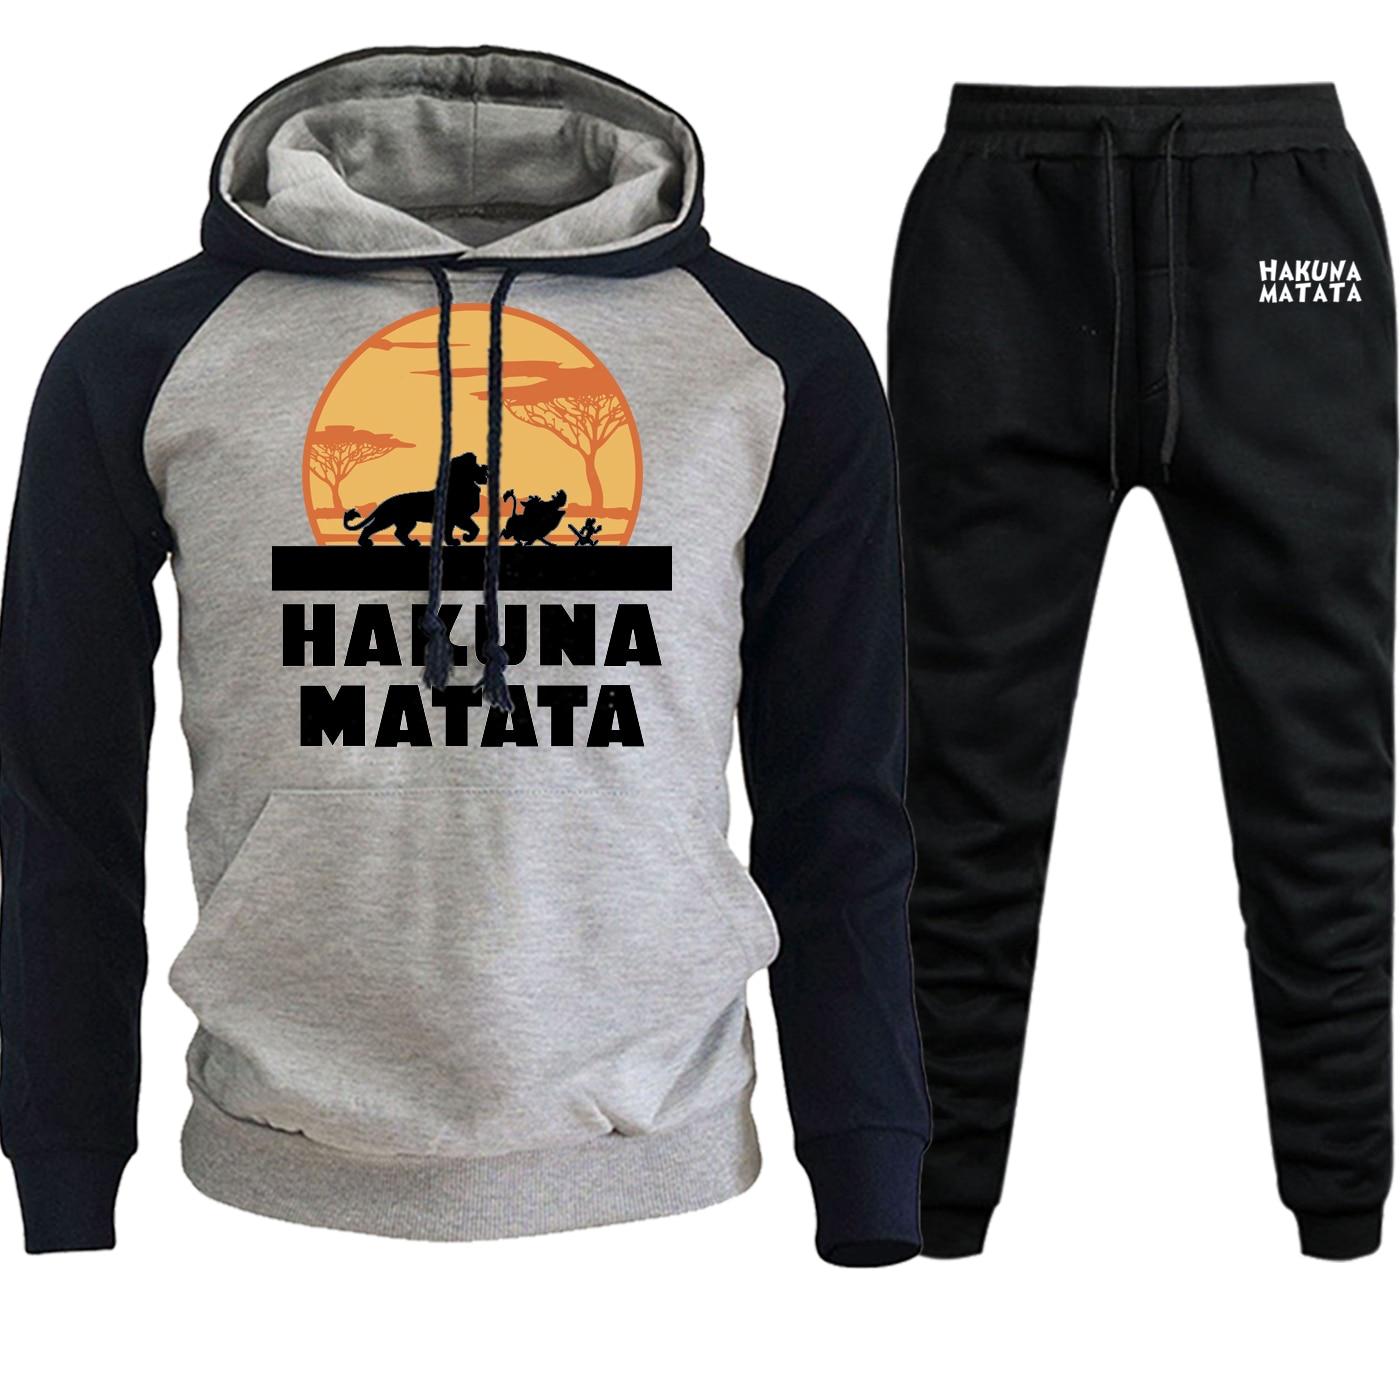 Cartoon Hoodies Men Raglan Streetwear 2019 New Autumn Winter The Lion King Hooded Suit Hip Hop Fleece Pullover+Pants 2 Piece Set